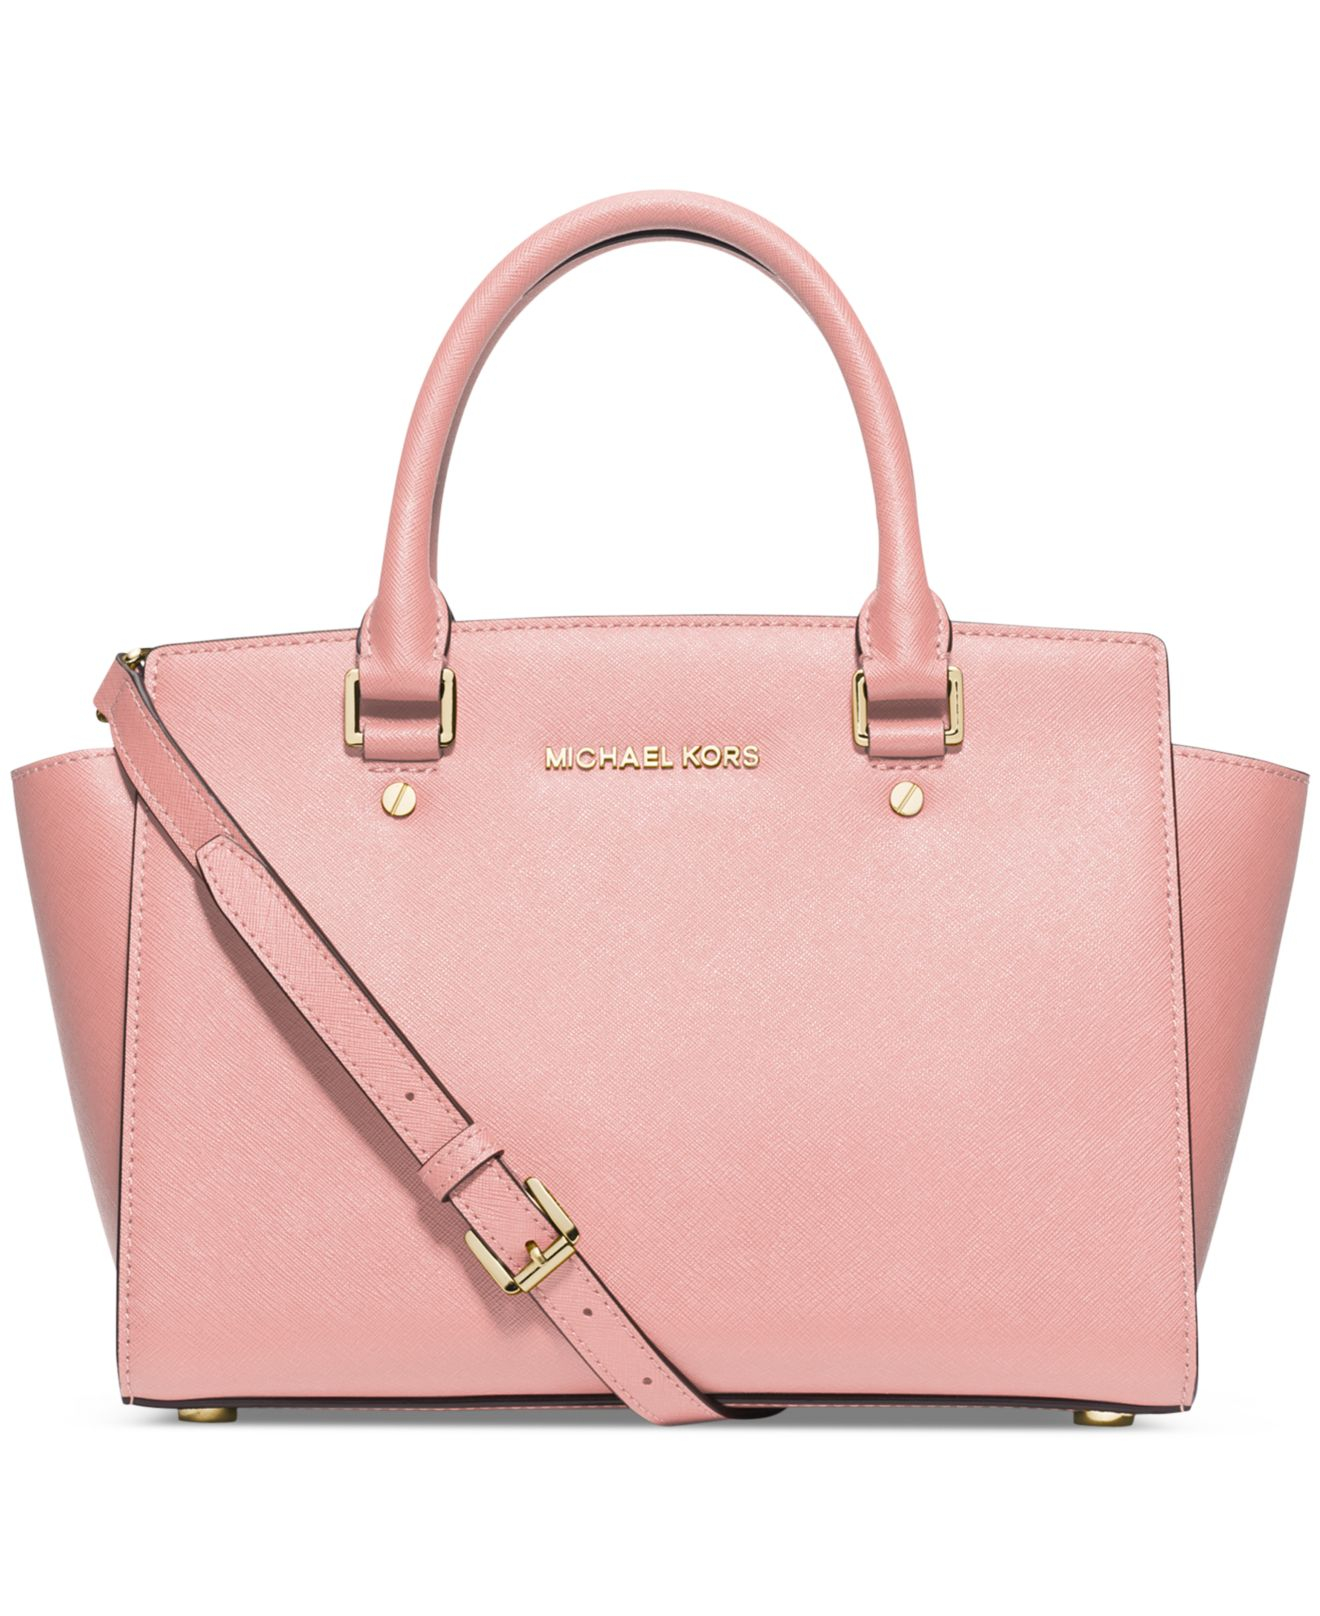 michael kors michael selma medium satchel in pink blossom. Black Bedroom Furniture Sets. Home Design Ideas